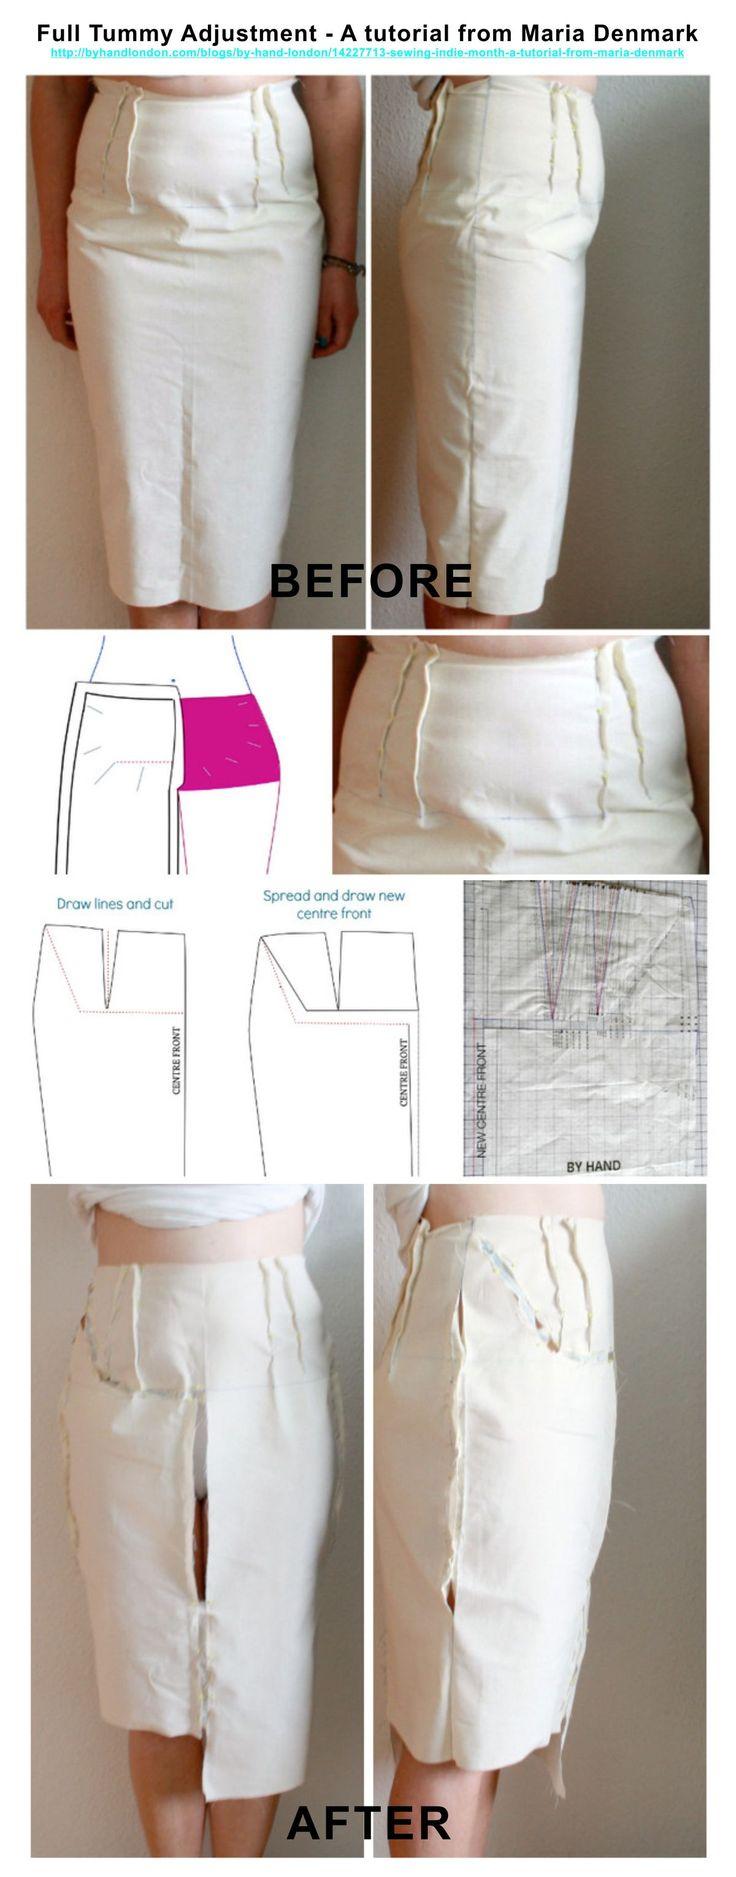 Full tummy pattern adjustment.